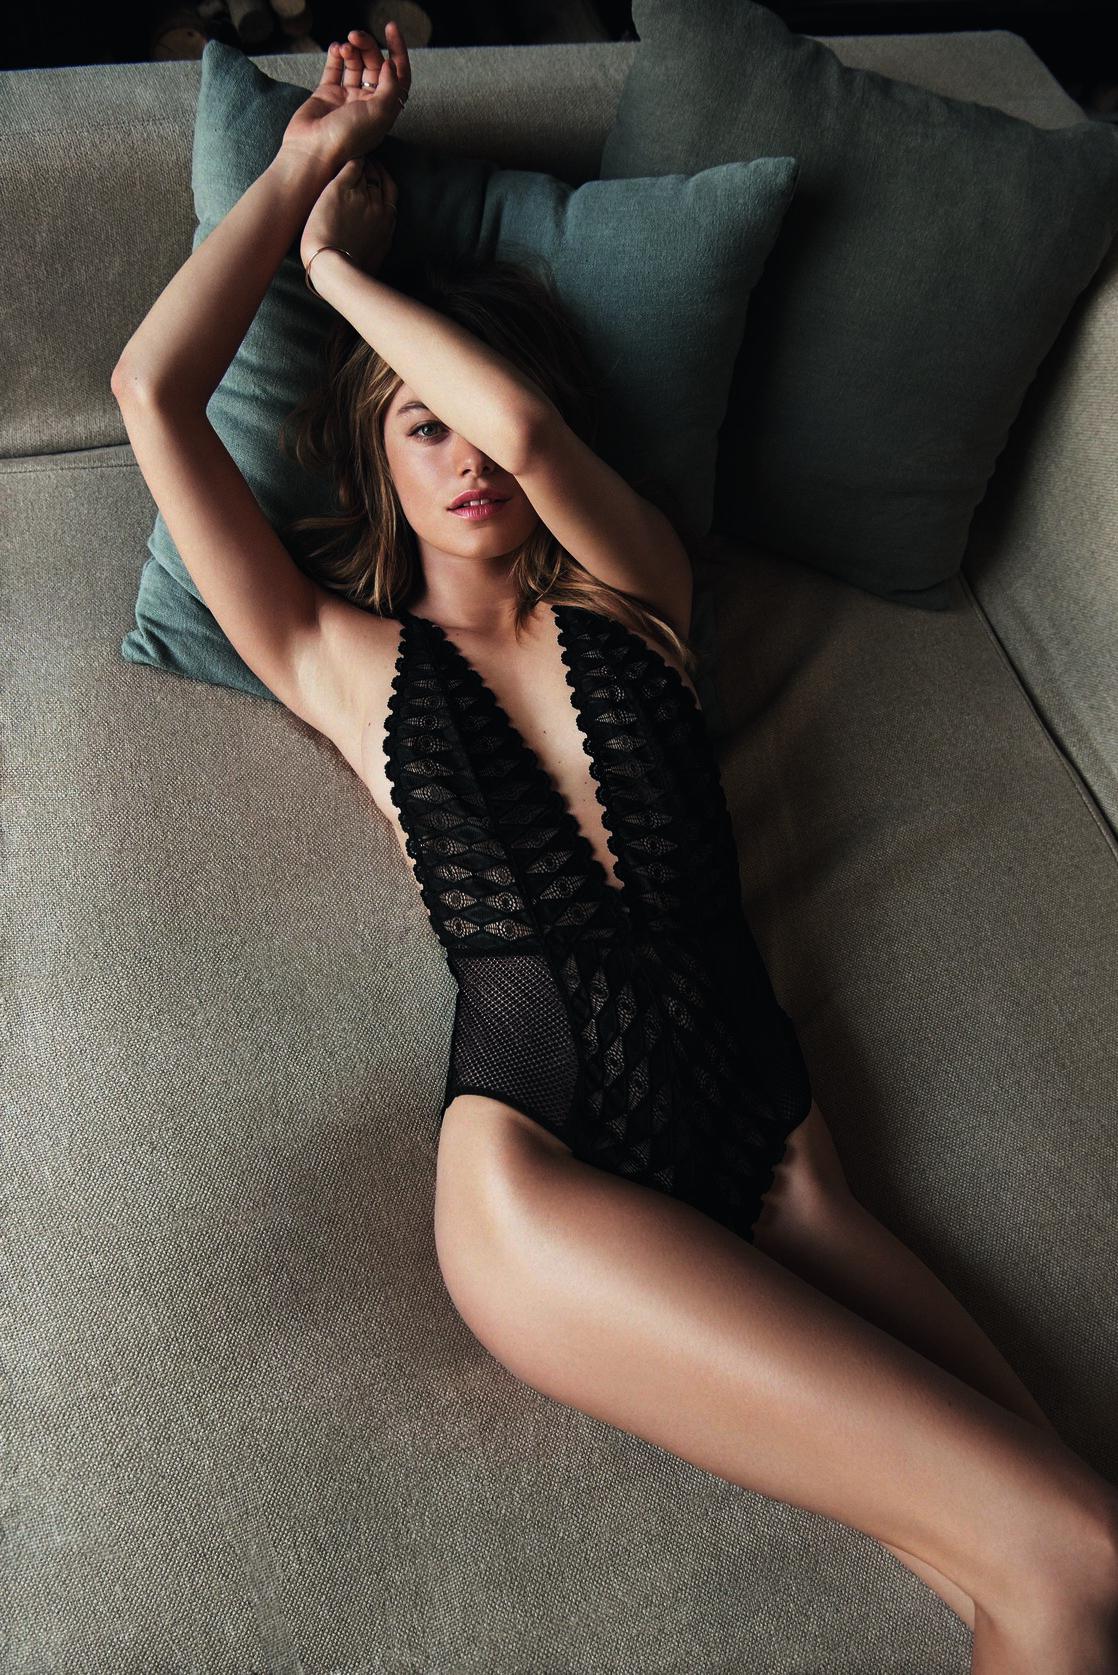 Forum on this topic: Mackenzie ziegler pics social media, masturbation-videos/